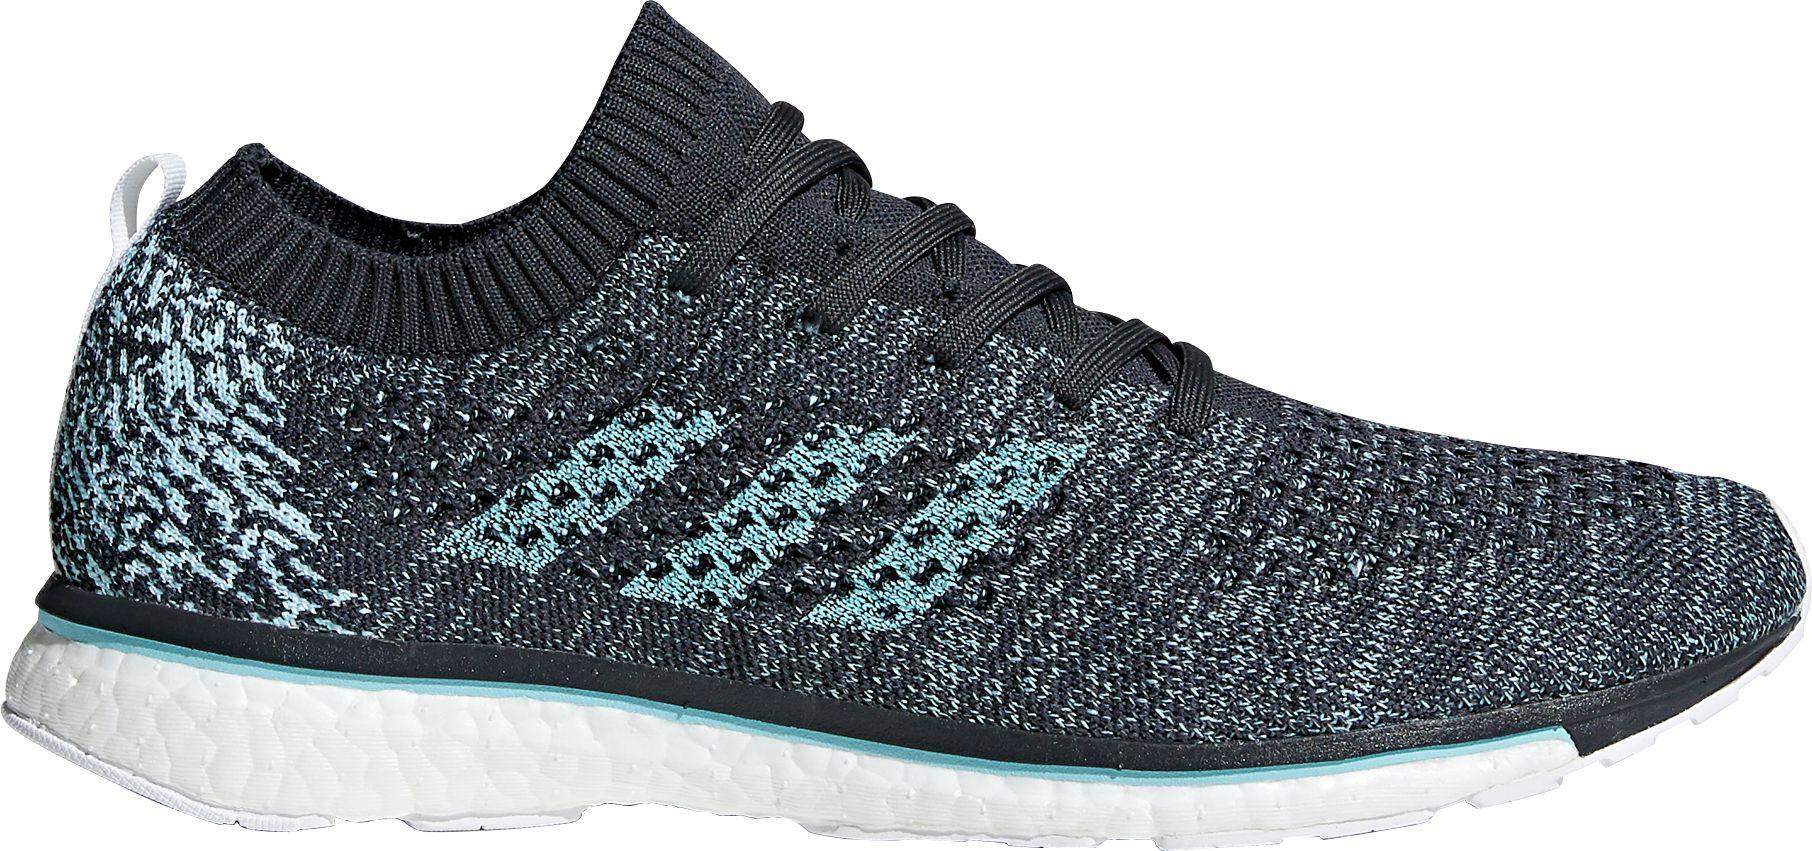 los angeles 33d73 58ee3 Adidas - Multicolor Adizero Prime Parley Running Shoes for Men - Lyst